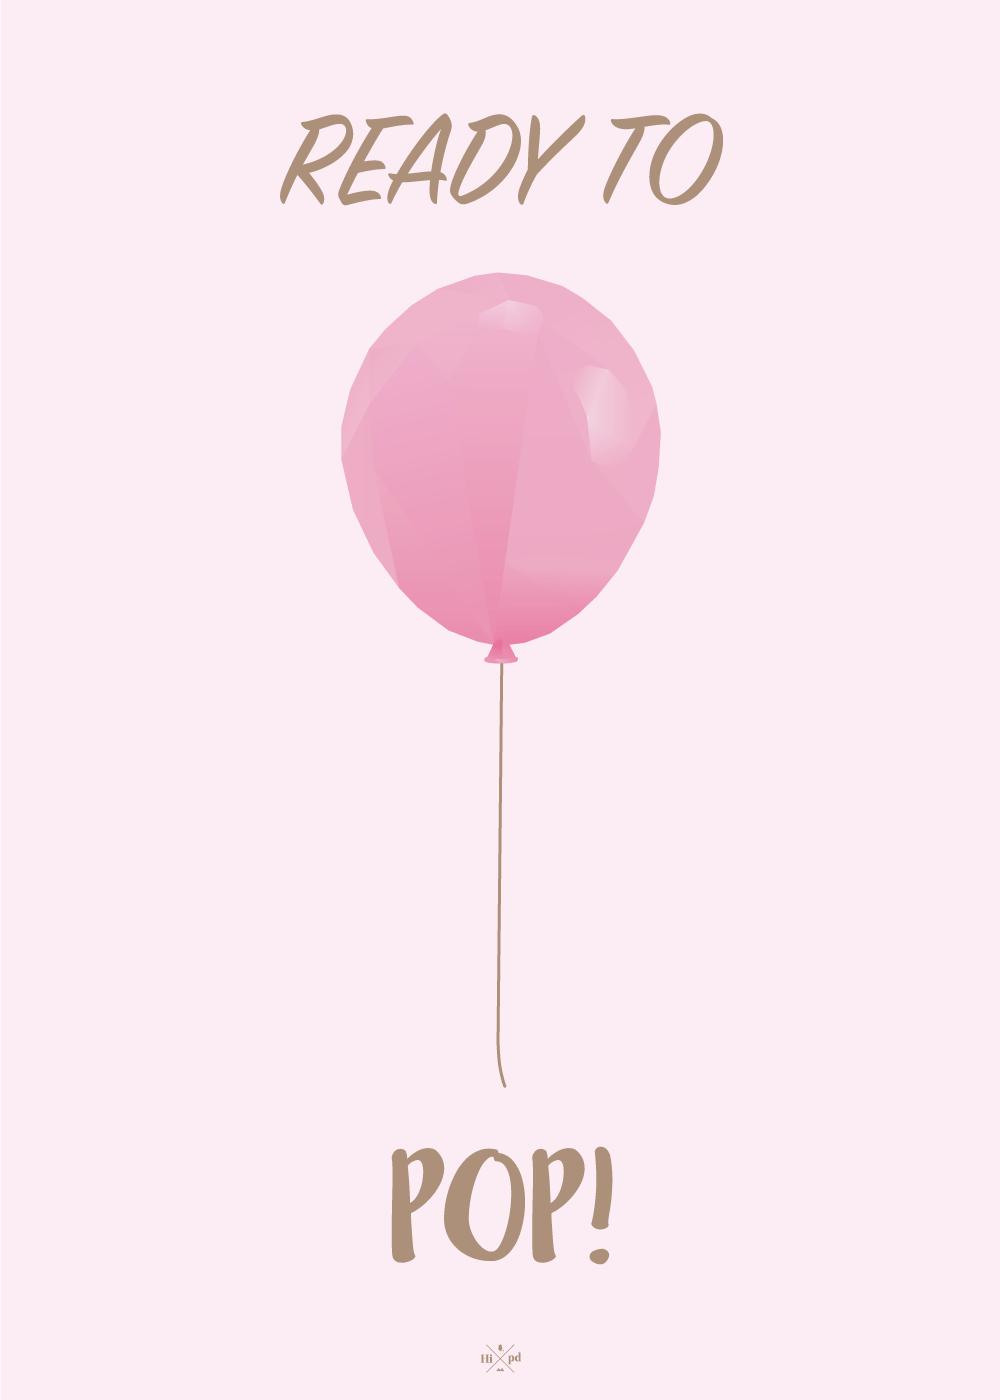 Ready to pop - Babyshower plakat